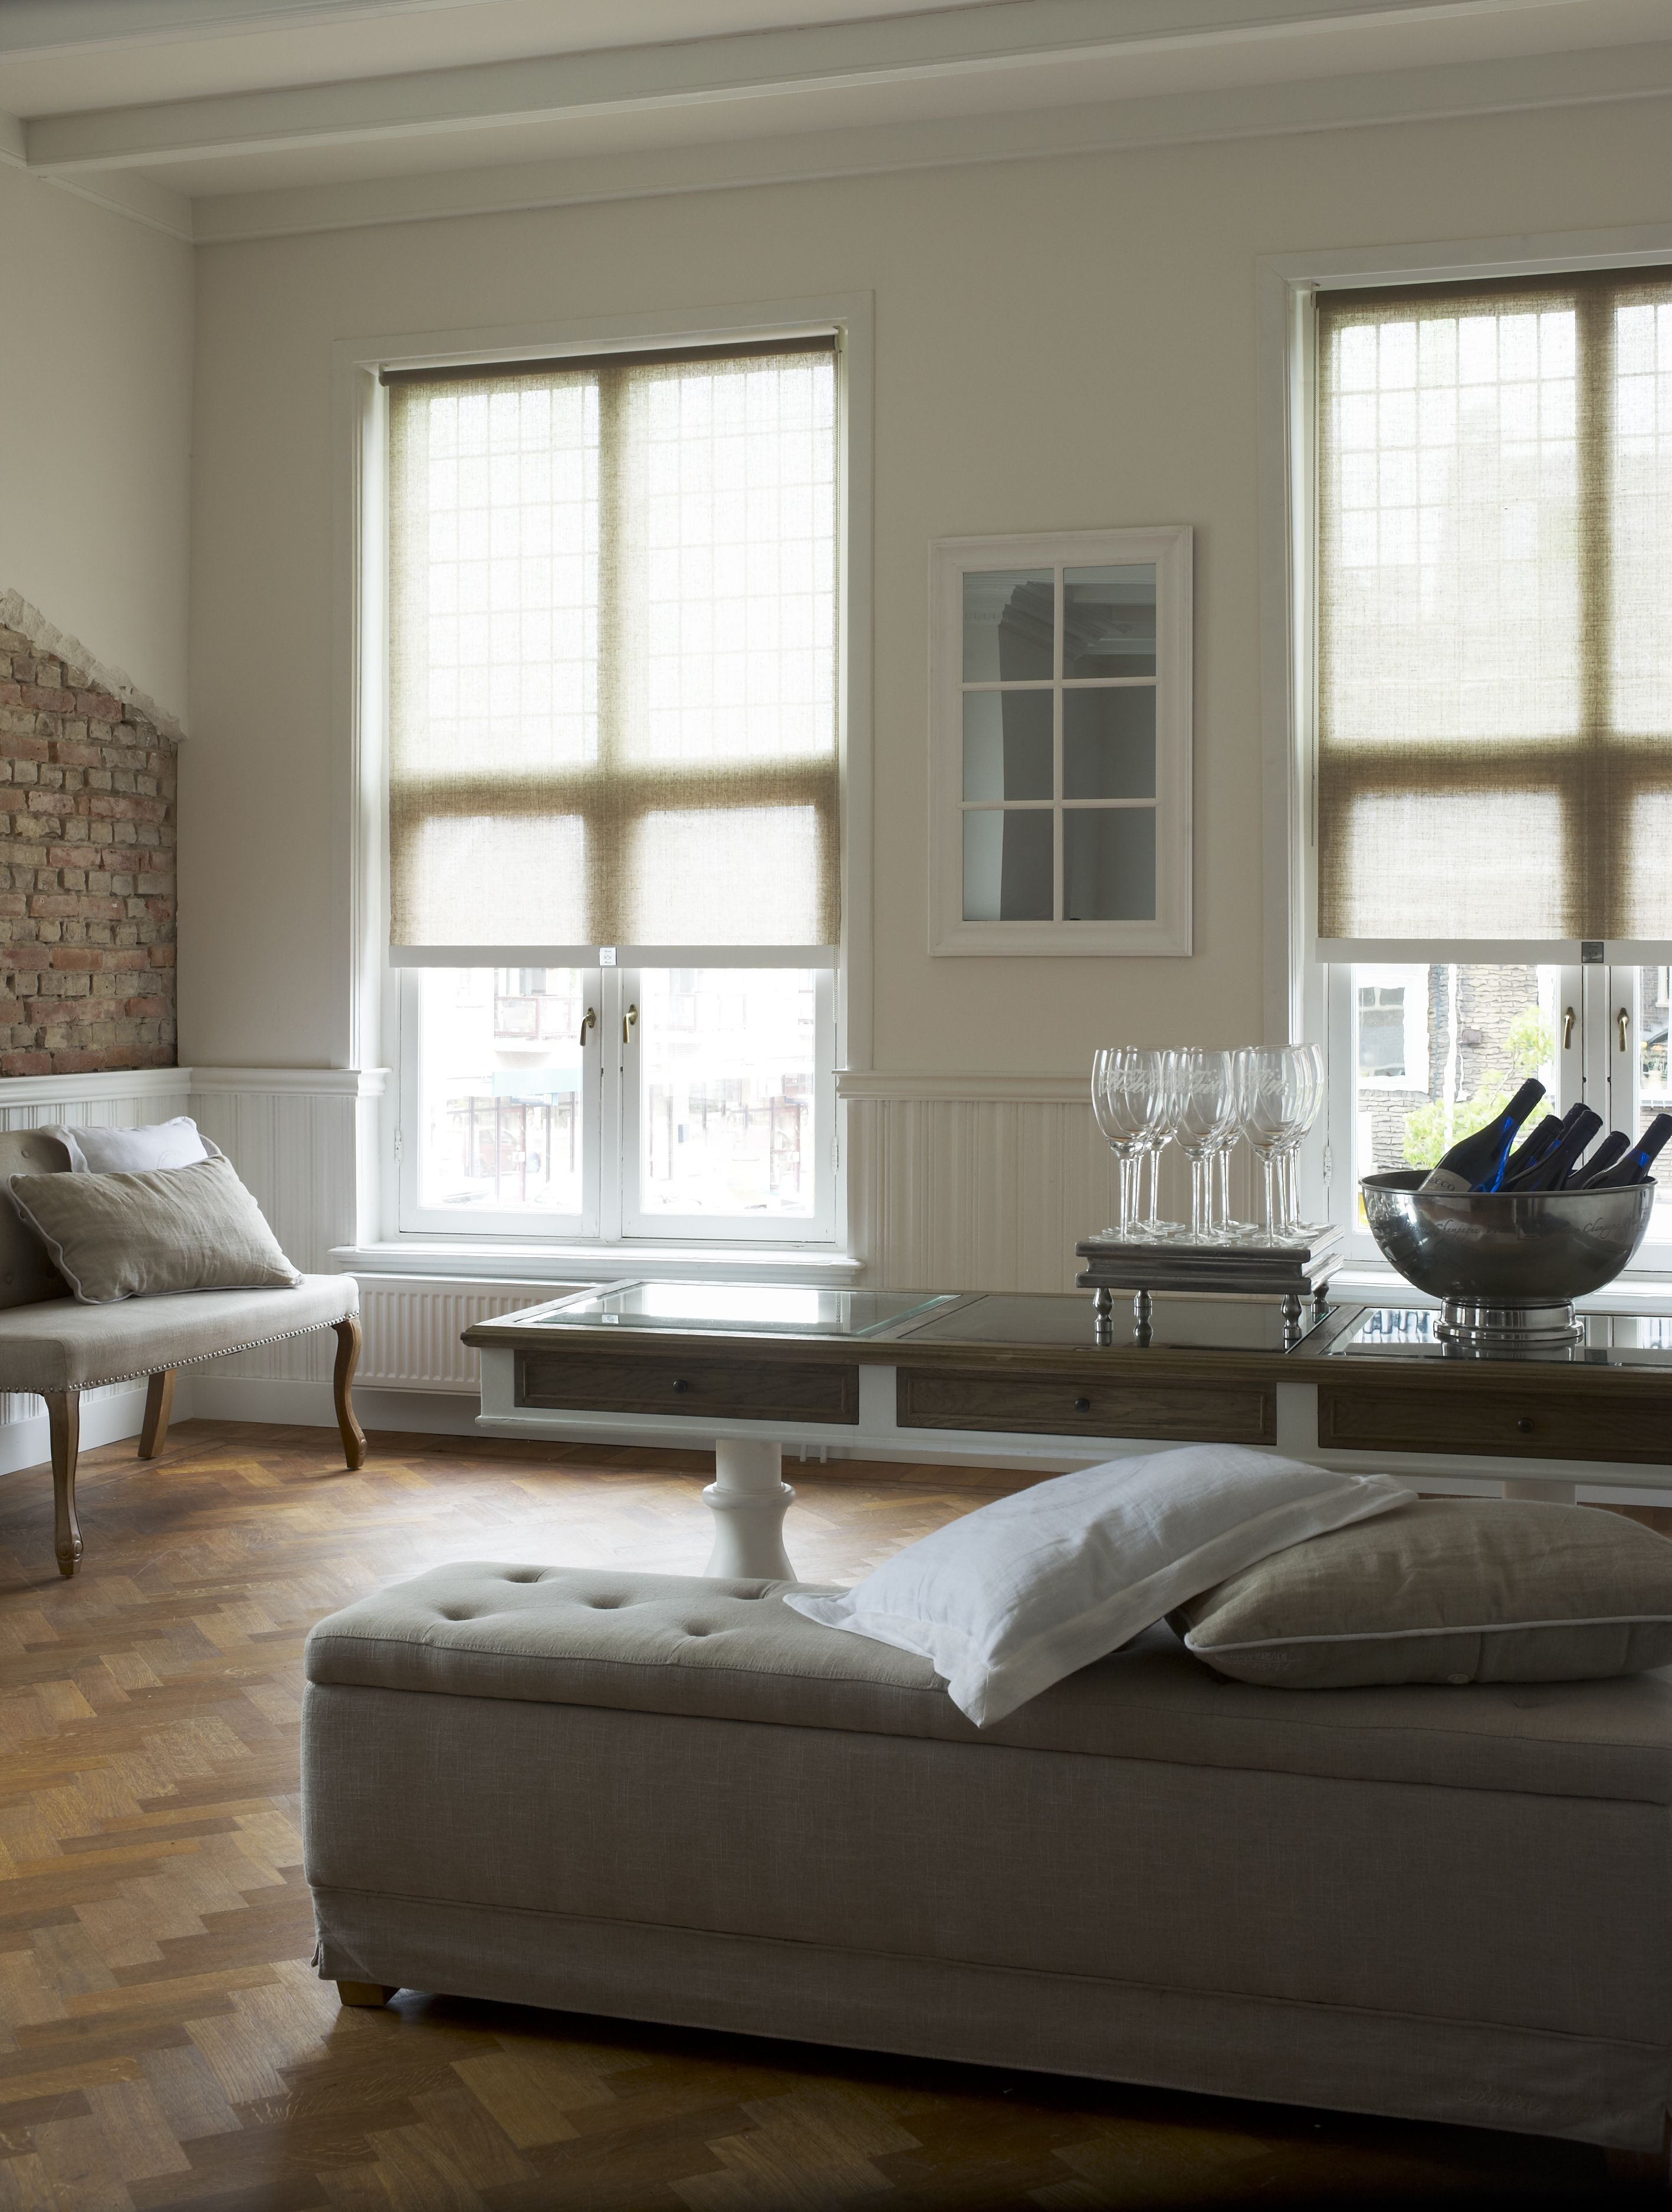 RivieraMaison. Rivièra Maison model: #FirstAvenue is een prachtig ...